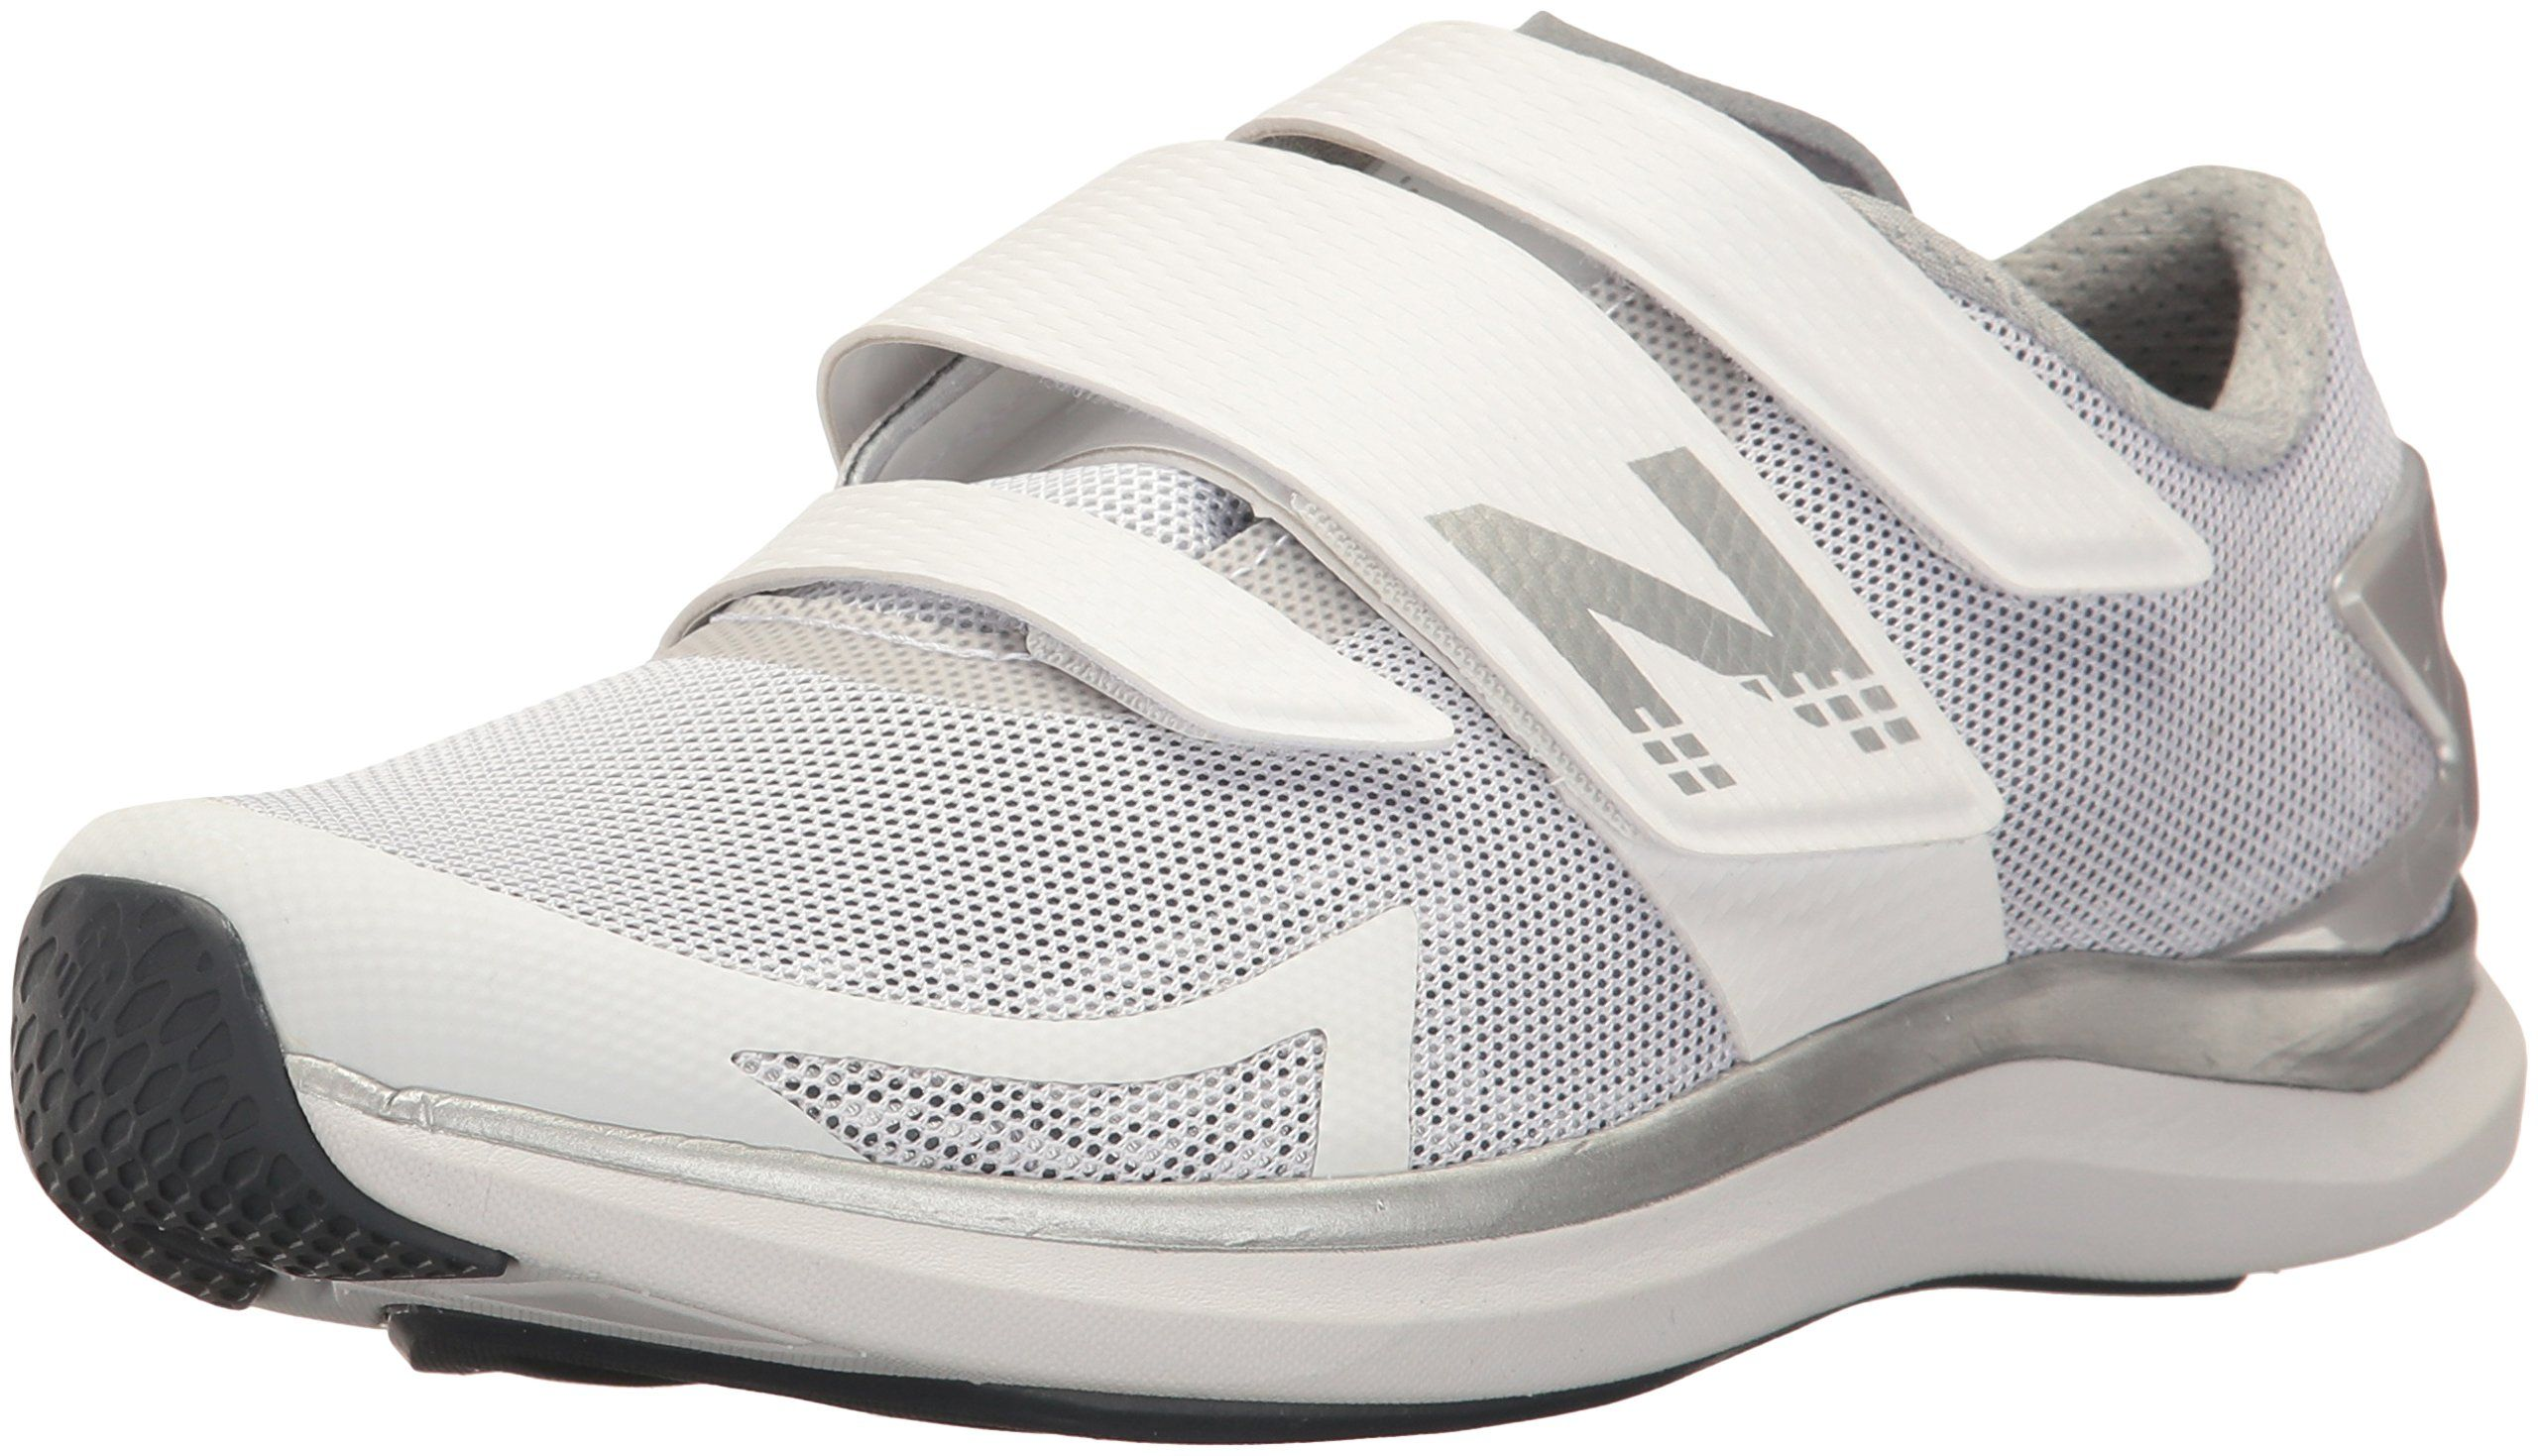 New Balance Womens Indoor Cycling Shoe White Thunder 8 5 B Us